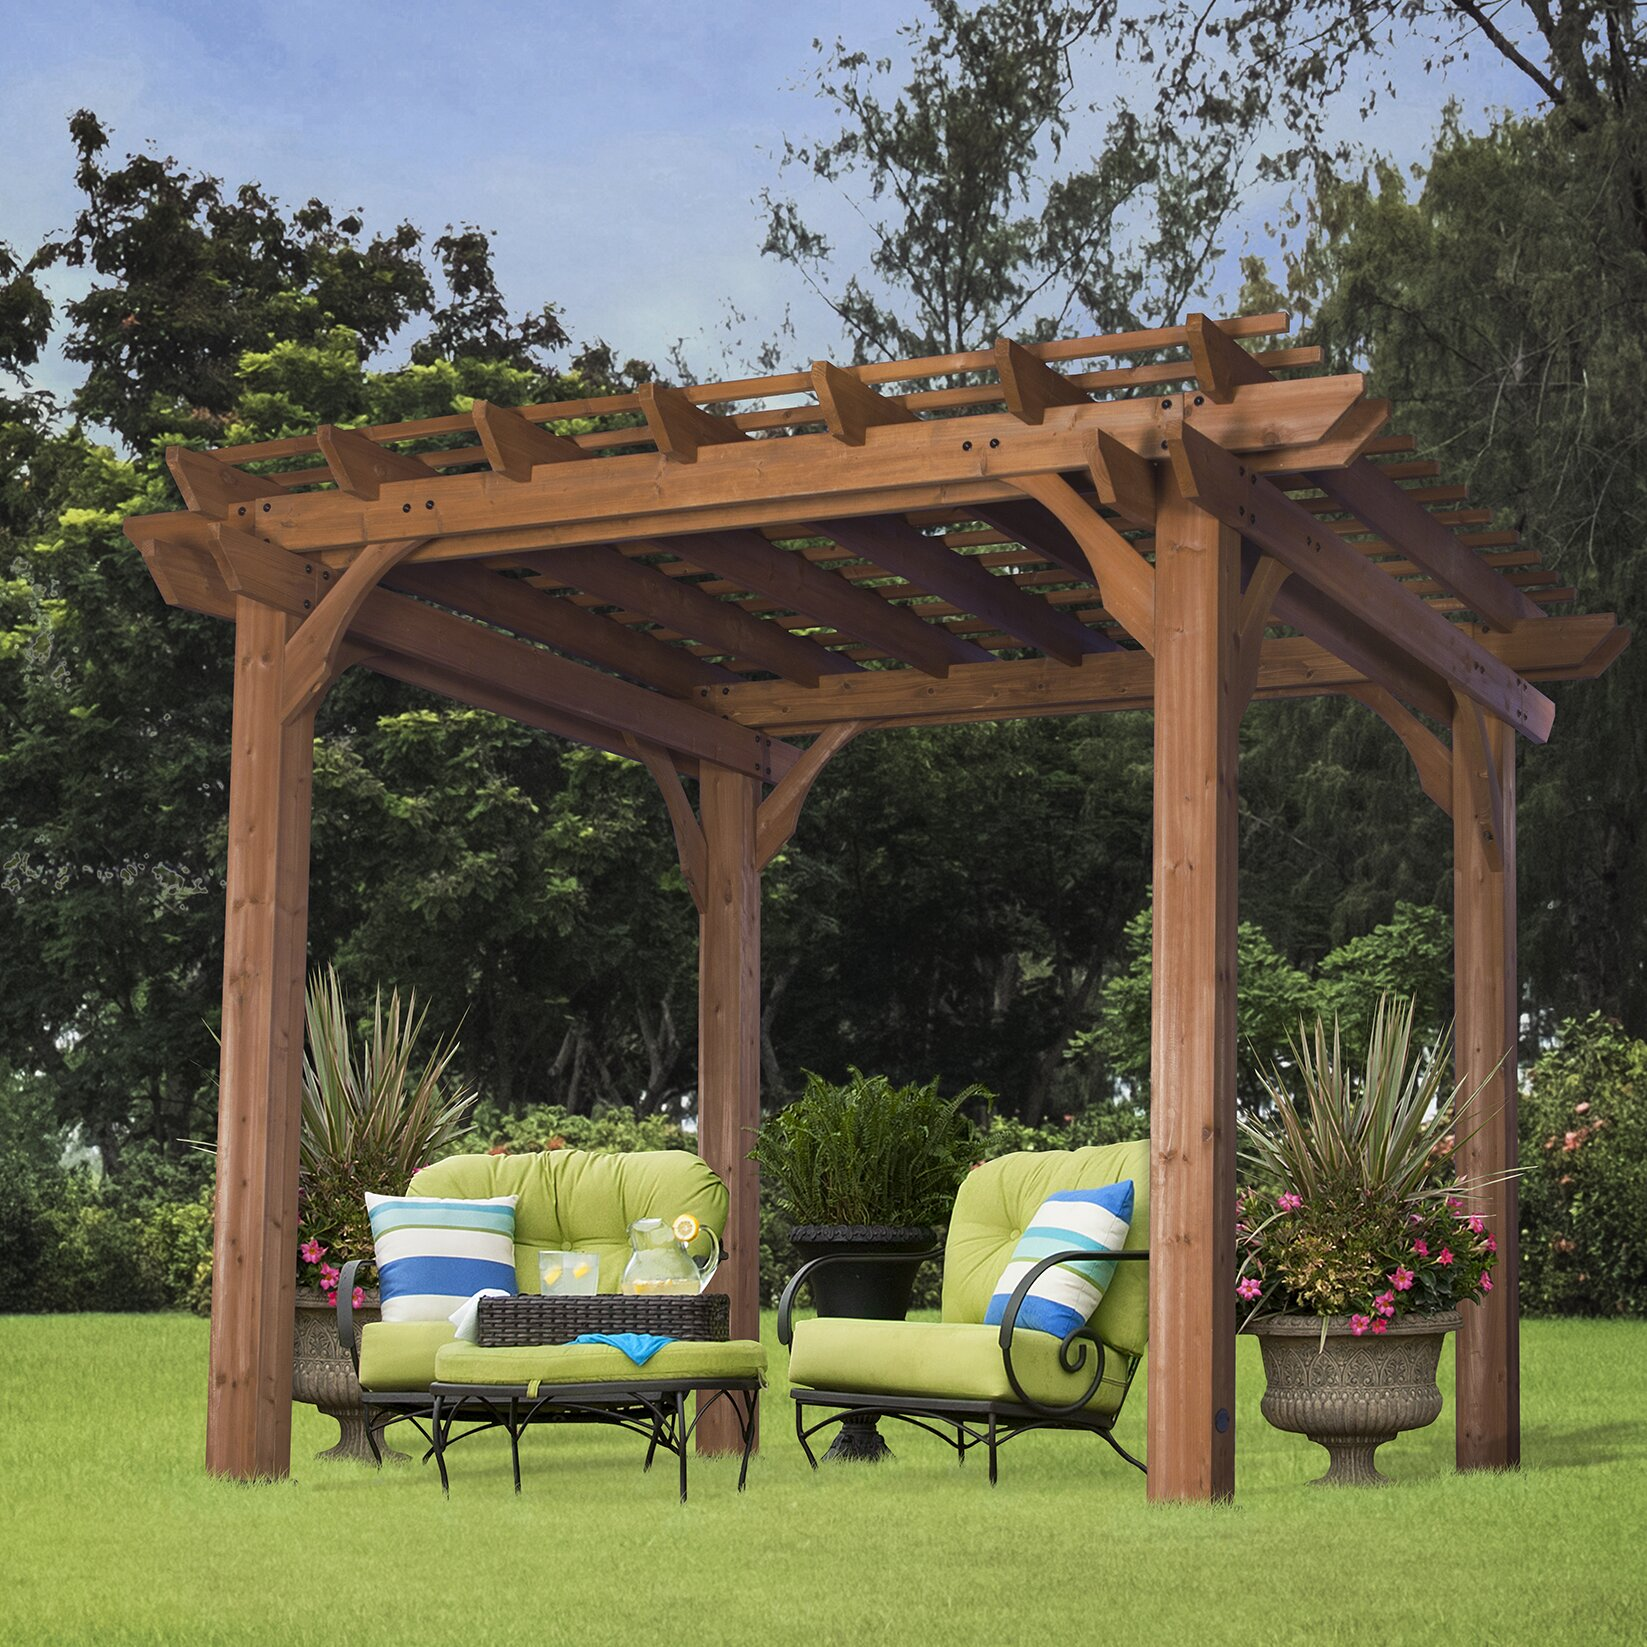 backyard discovery 7 8 ft h x 10 ft w x 10 ft d cedar pergola